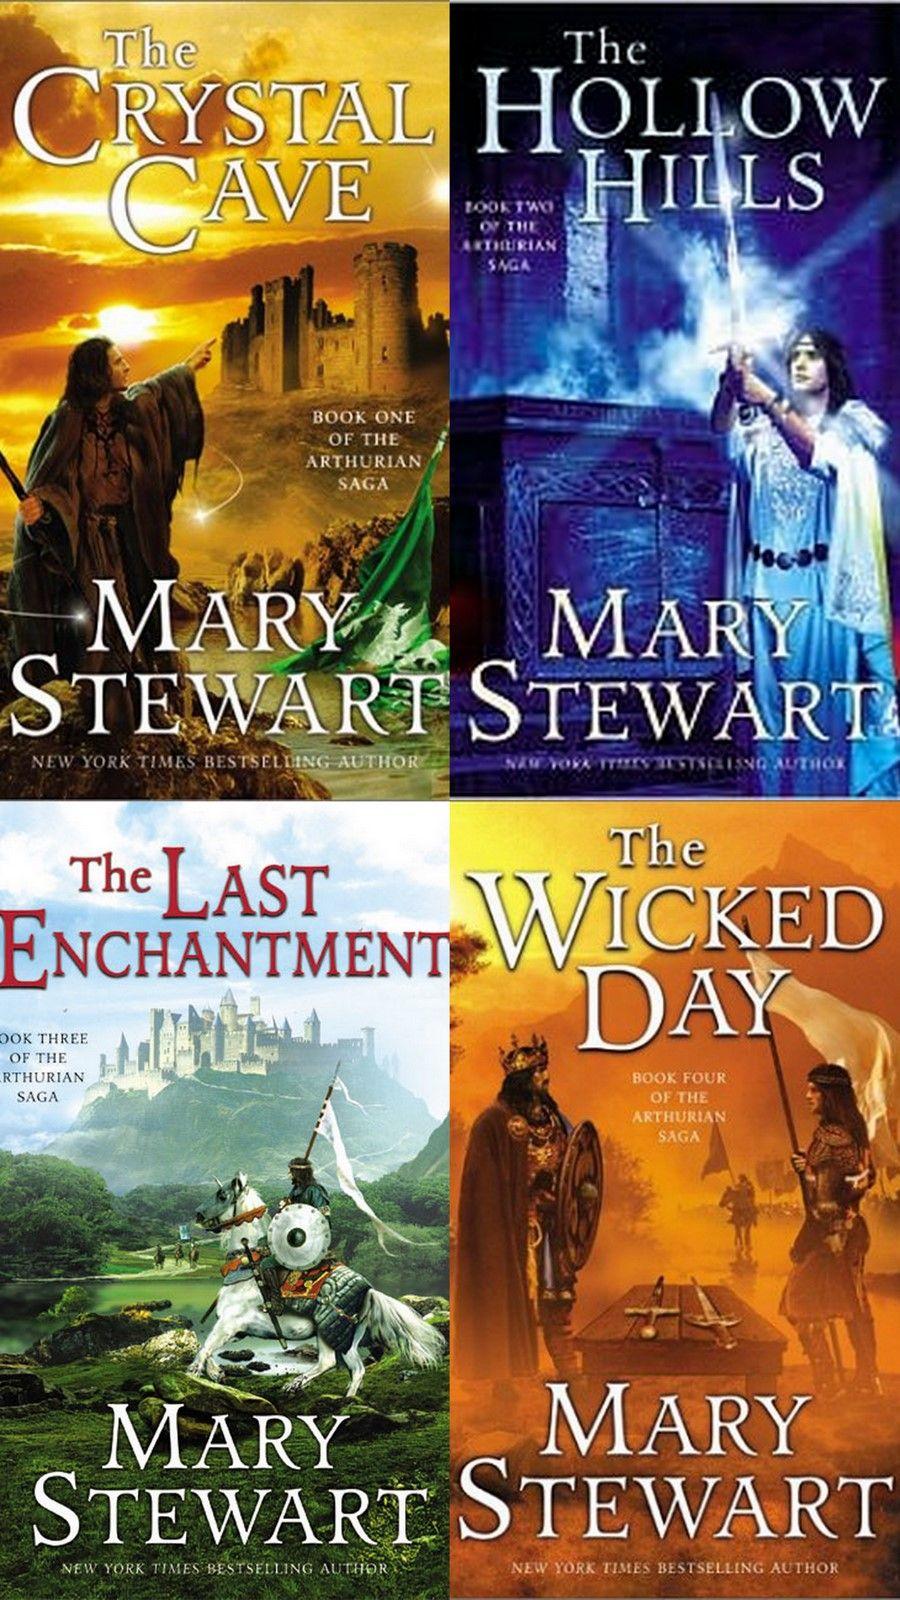 The Arthurian Saga, featuring Merlin, Mary Stewart... Loved them